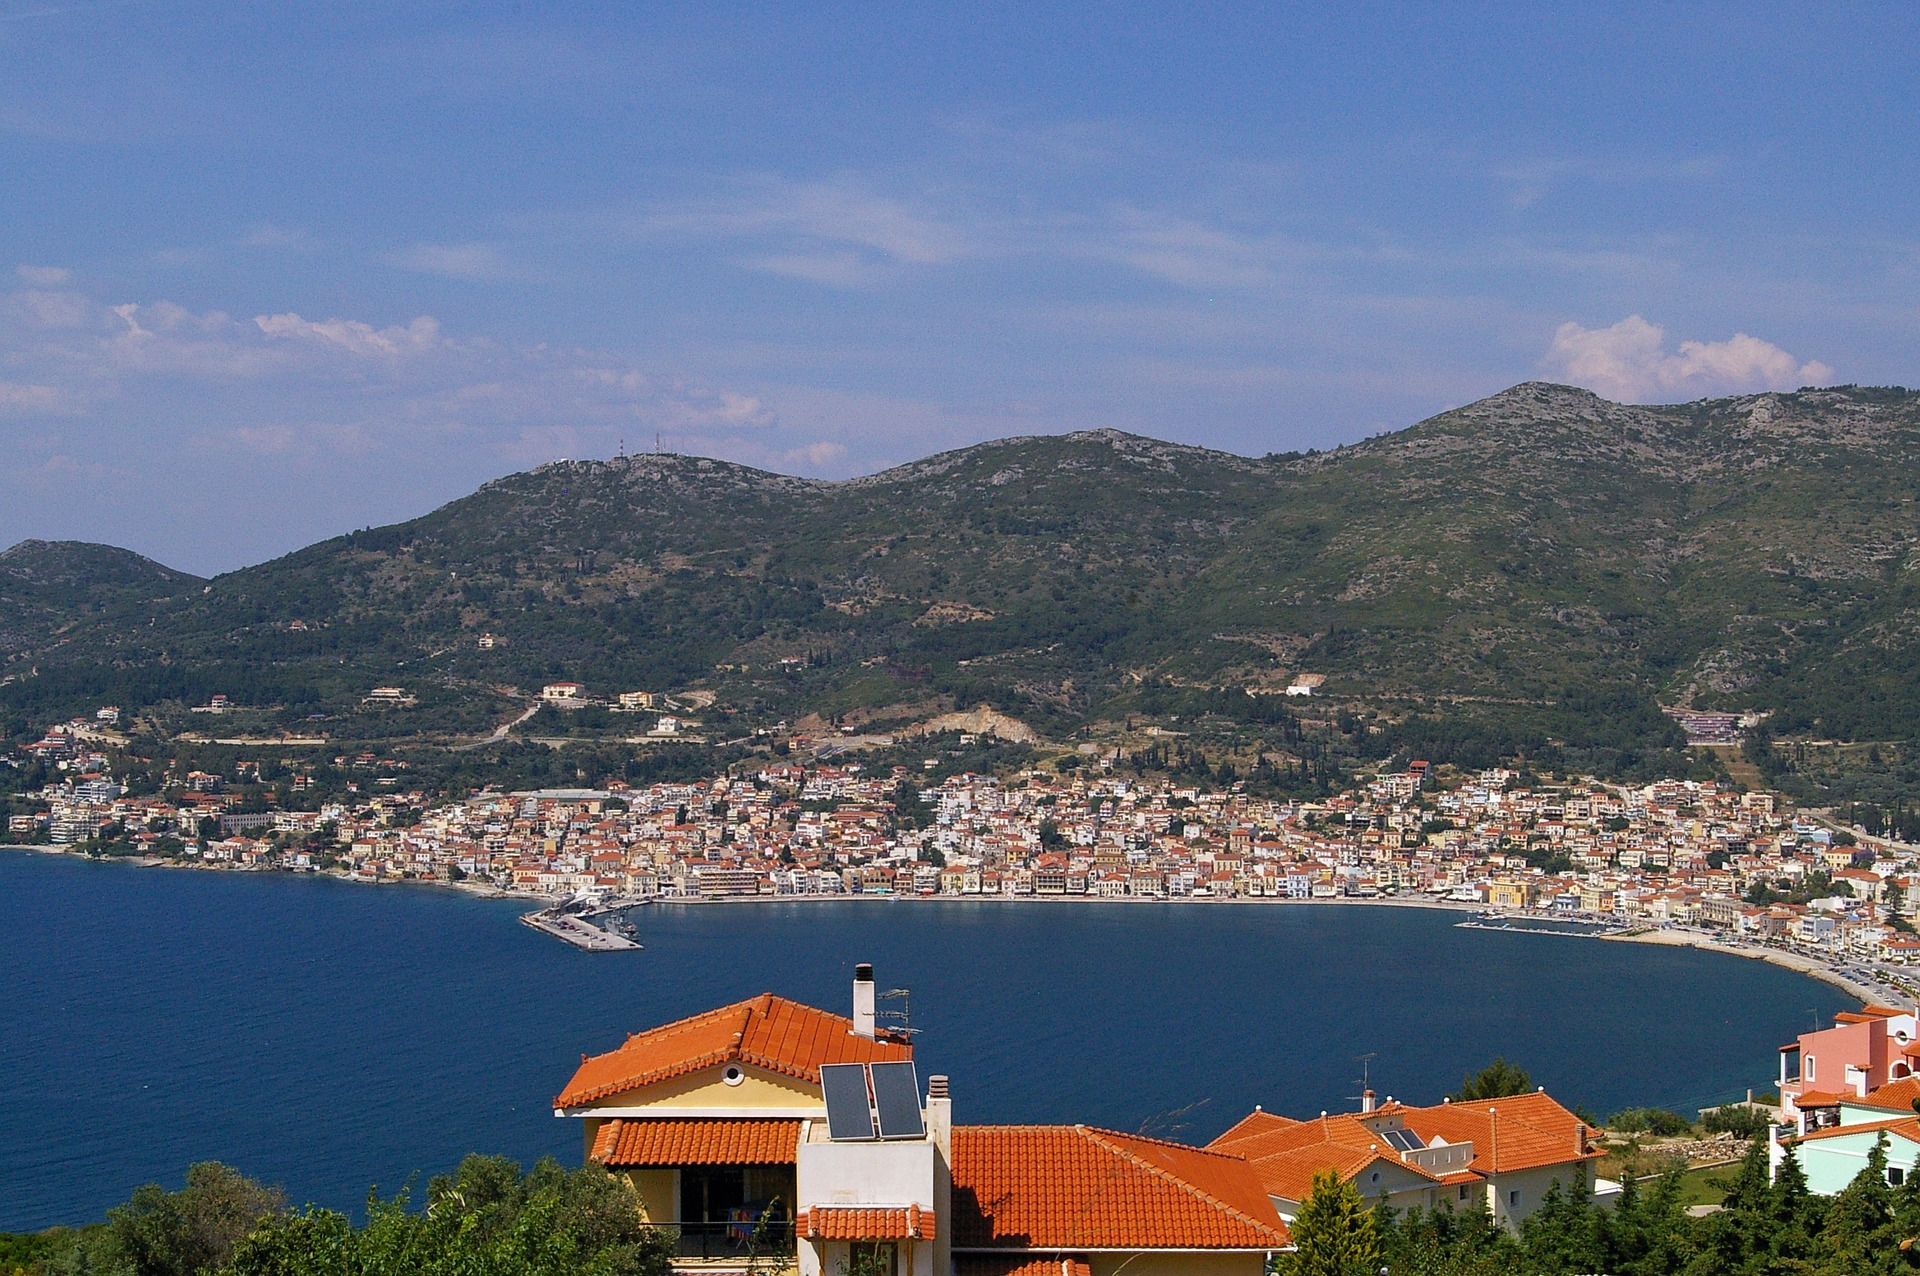 "Yunanistan'ın Samos Adası Cuma günü tsunamiyle sonuçlanan bir depremle sarsıldı, 30 Ekim Bilgi: <a href=""https://pixabay.com/users/kriemer-932379/?utm_source=link-attribution&utm_medium=referral&utm_campaign=image&utm_content=867143"">Kerstin Riemer</a>, <a href=""https://pixabay.com/?utm_source=link-attribution&utm_medium=referral&utm_campaign=image&utm_content=867143"">Pixabay</a>"